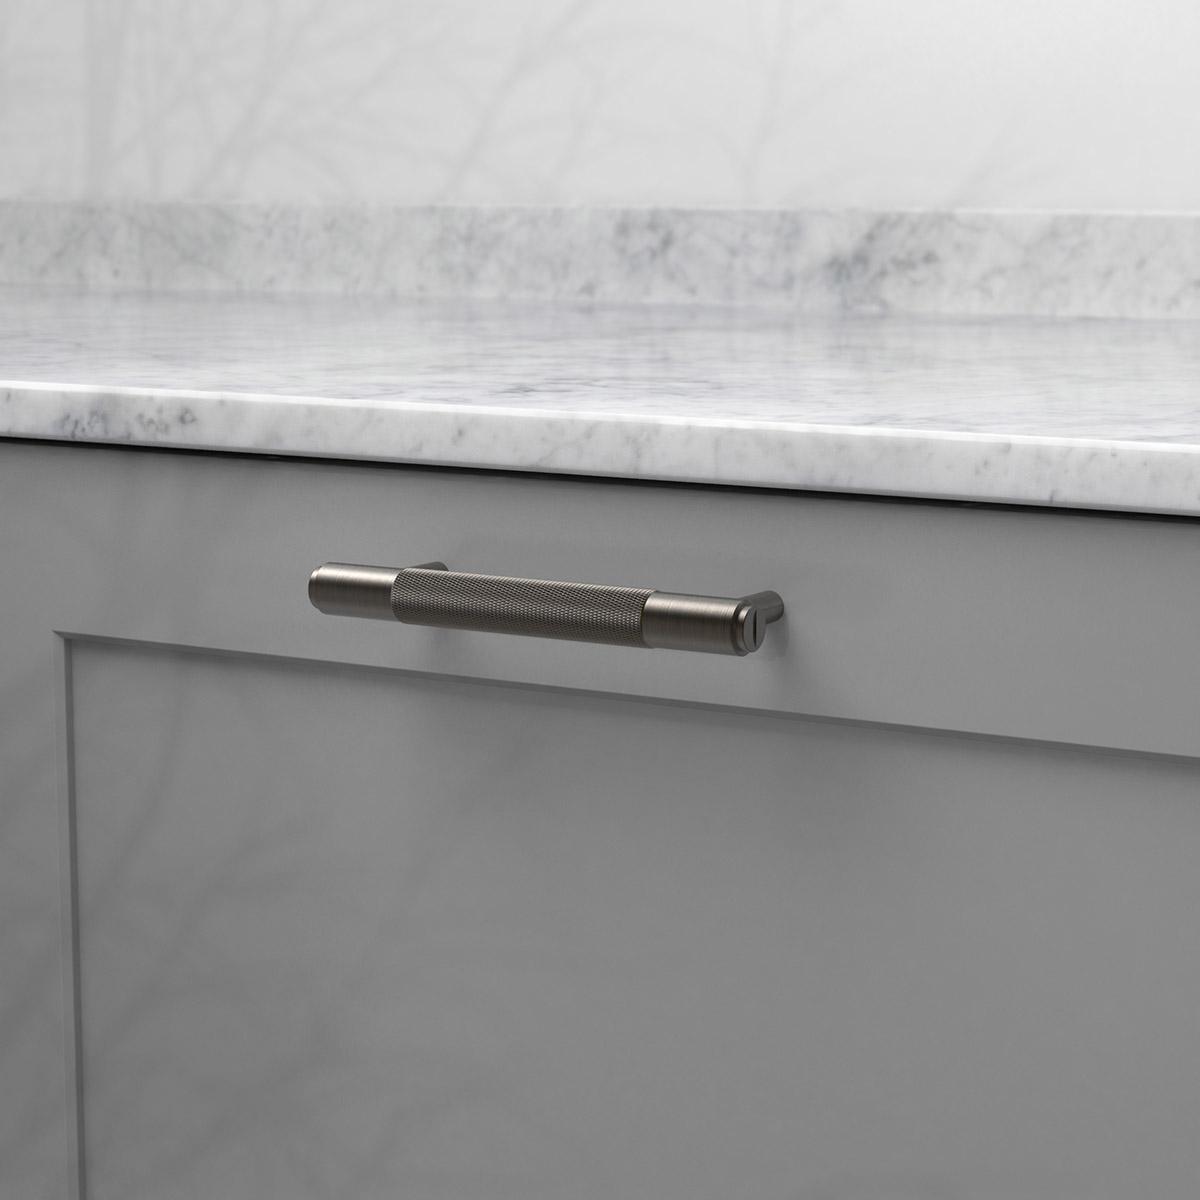 pull bar sotad brons uk pb h 160 sm a cc 125 mm ncs s 4500 n marmor carrara 2